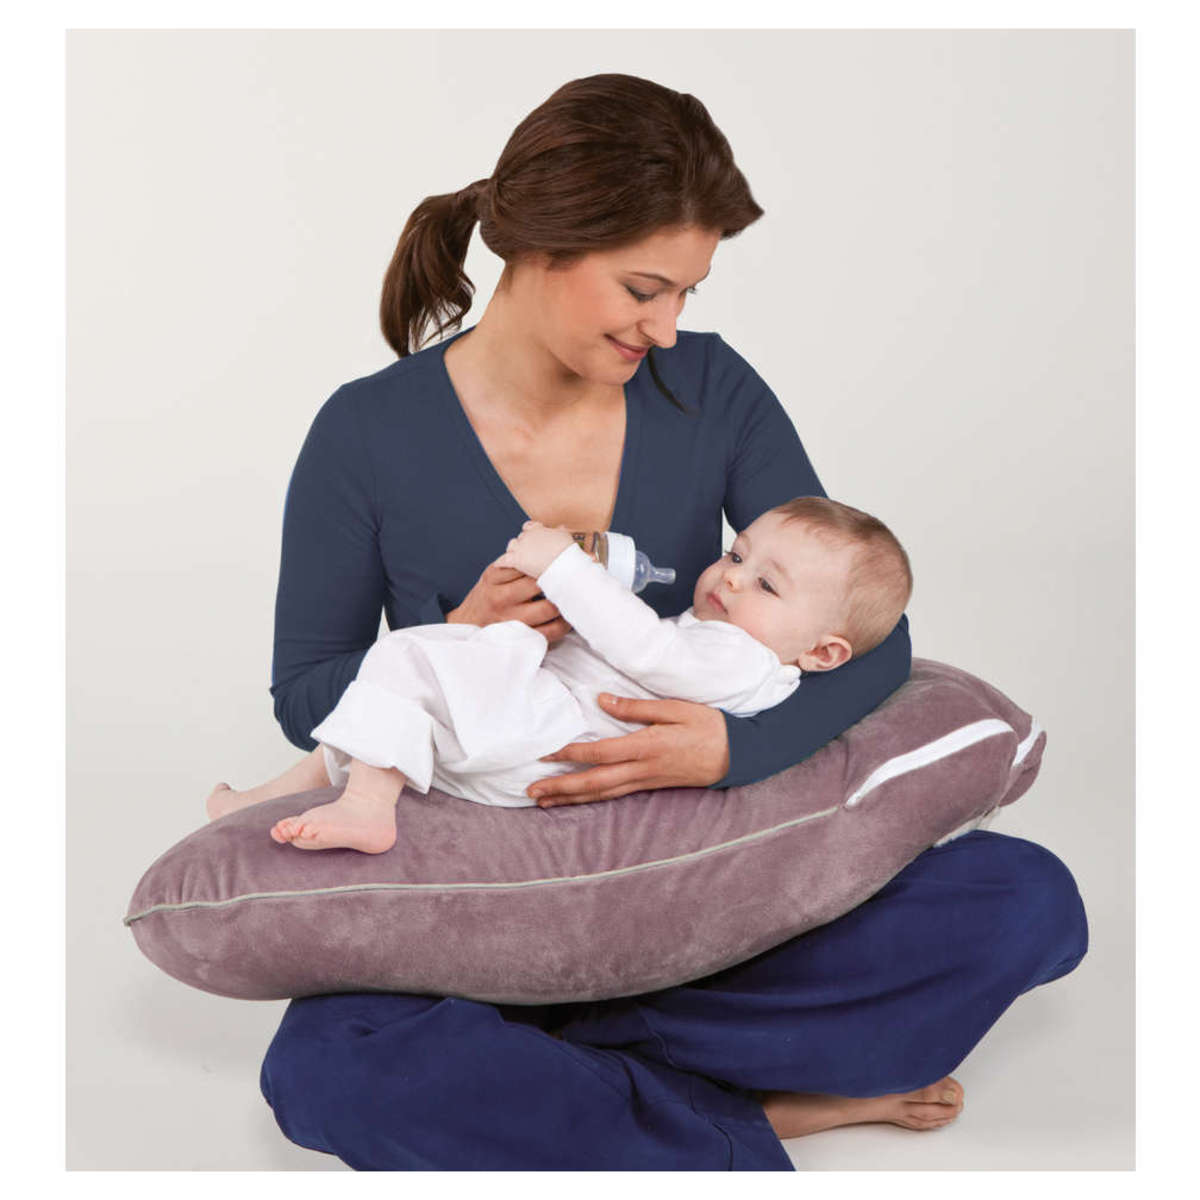 candide coussin d 39 allaitement multirelax etoiles multicolores coussin allaitement. Black Bedroom Furniture Sets. Home Design Ideas